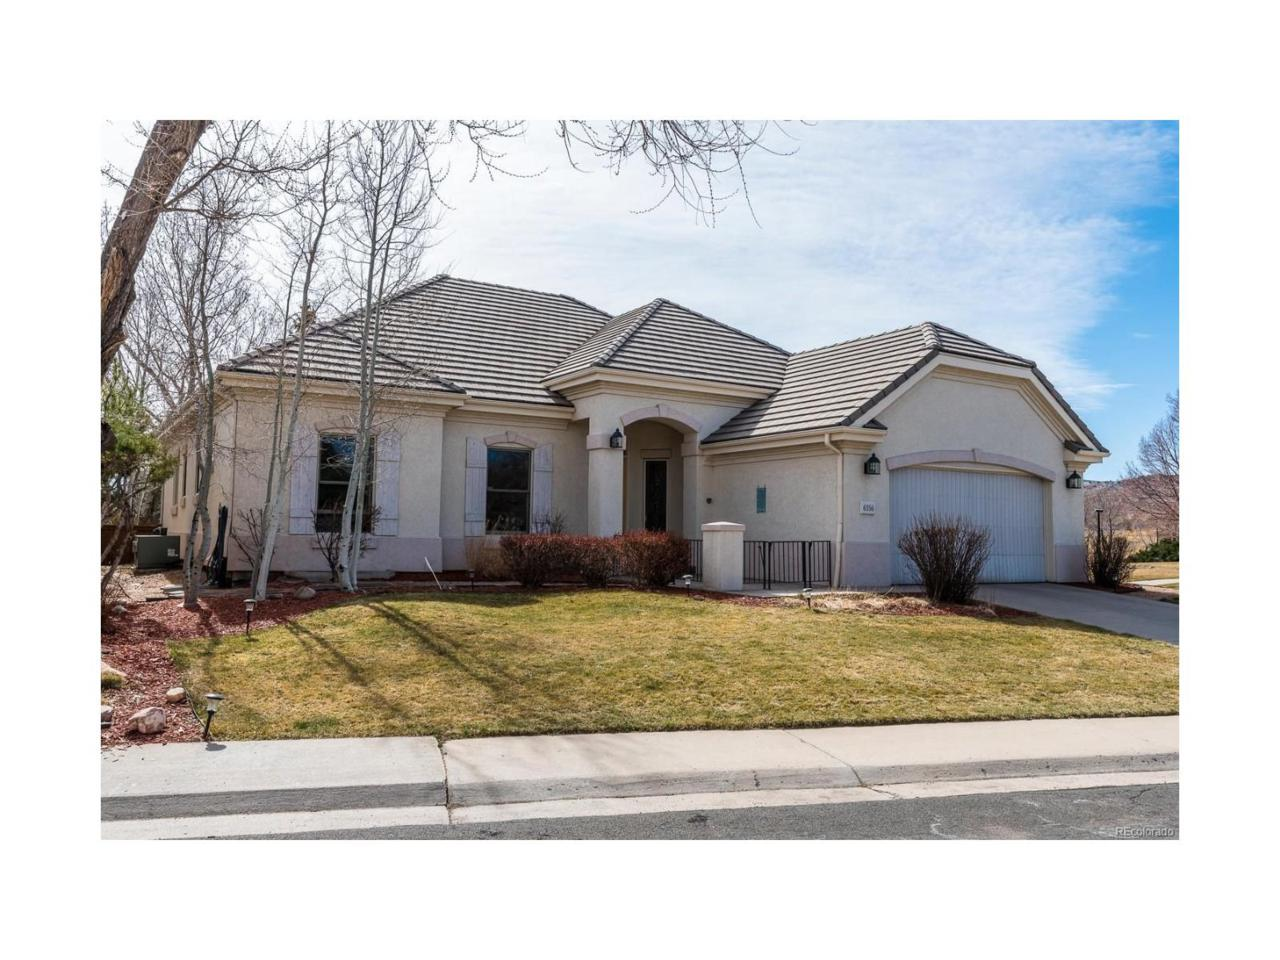 6356 S Urban Street, Littleton, CO 80127 (MLS #3567337) :: 8z Real Estate